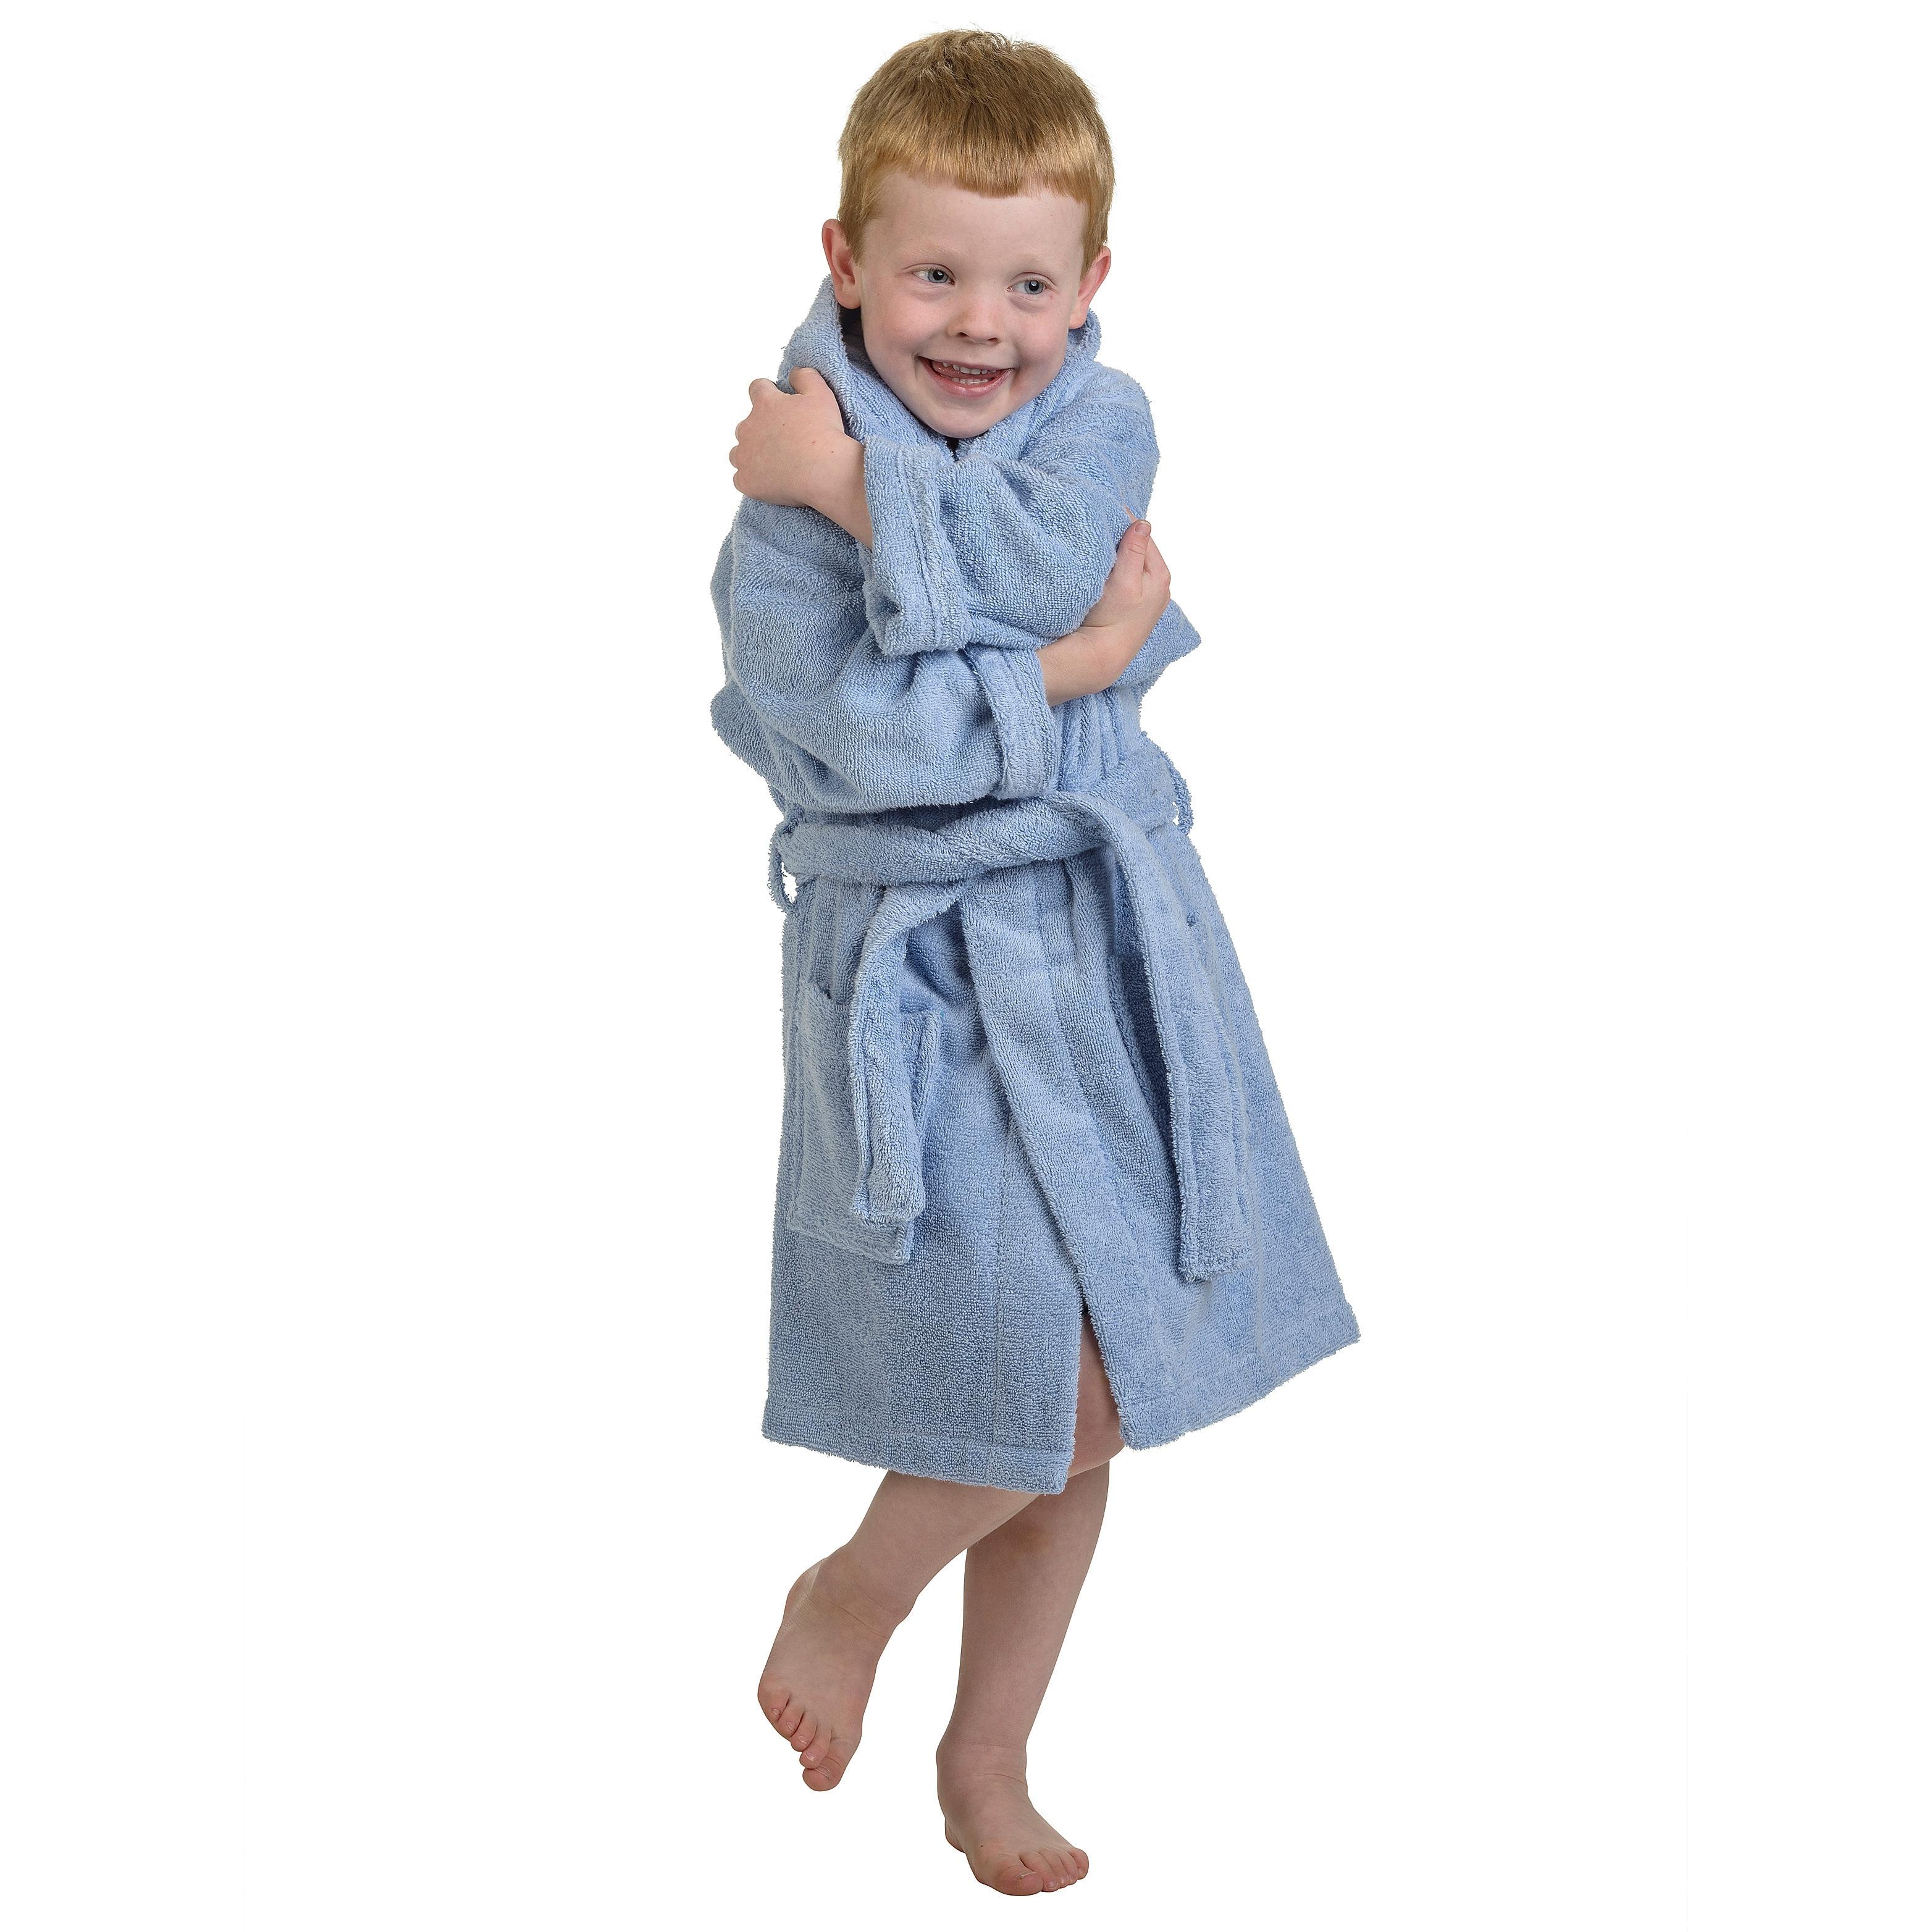 deccdcbd4 Shop Superior Collection Luxurious Cotton Kids Hooded Bath Robe ...